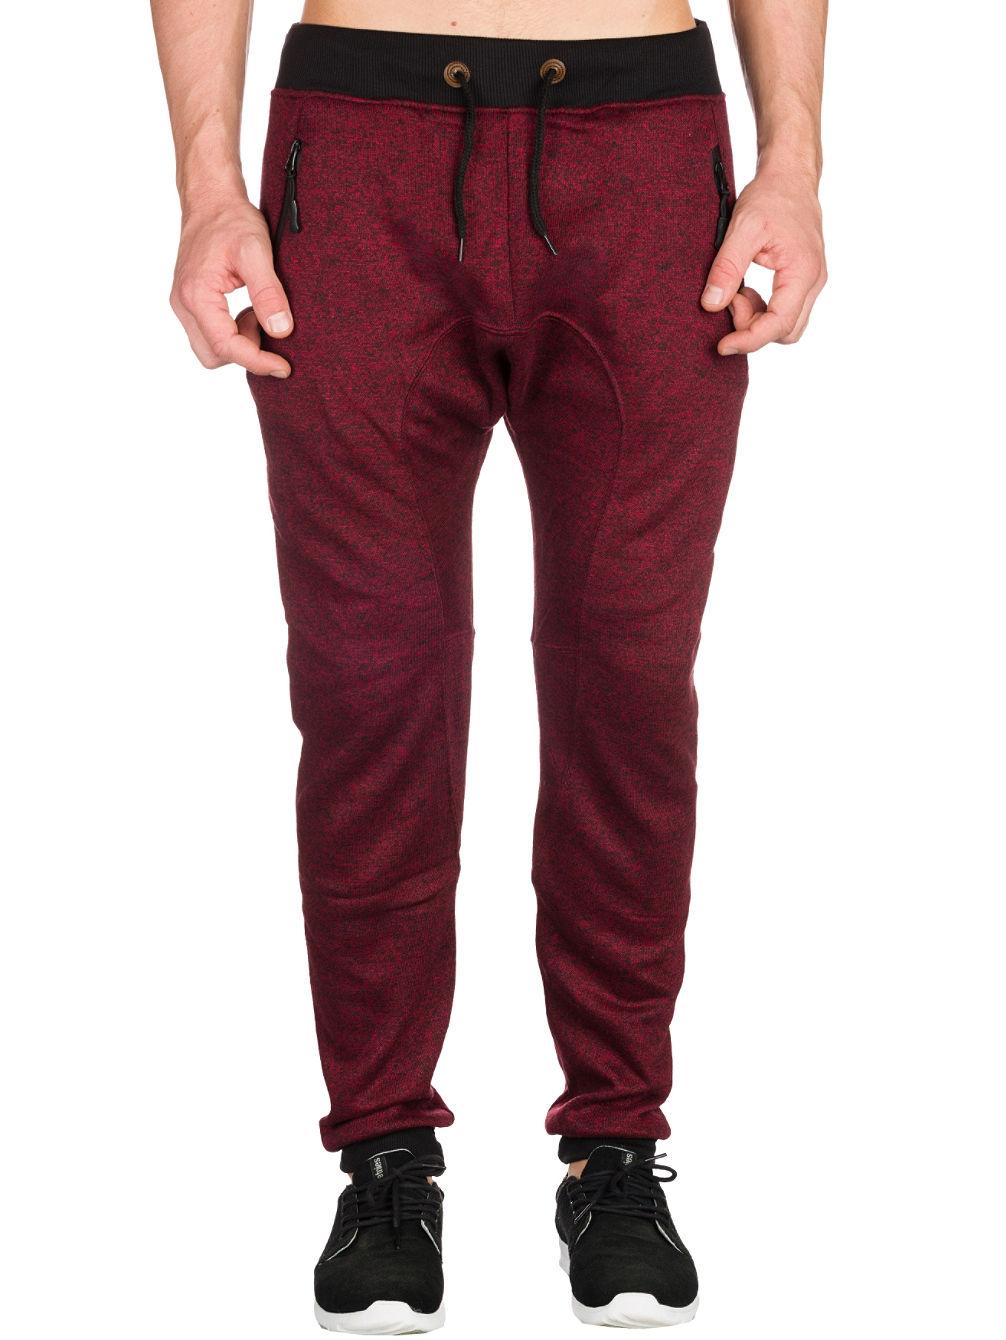 american-stitch-heather-h2o-zip-jogging-pants